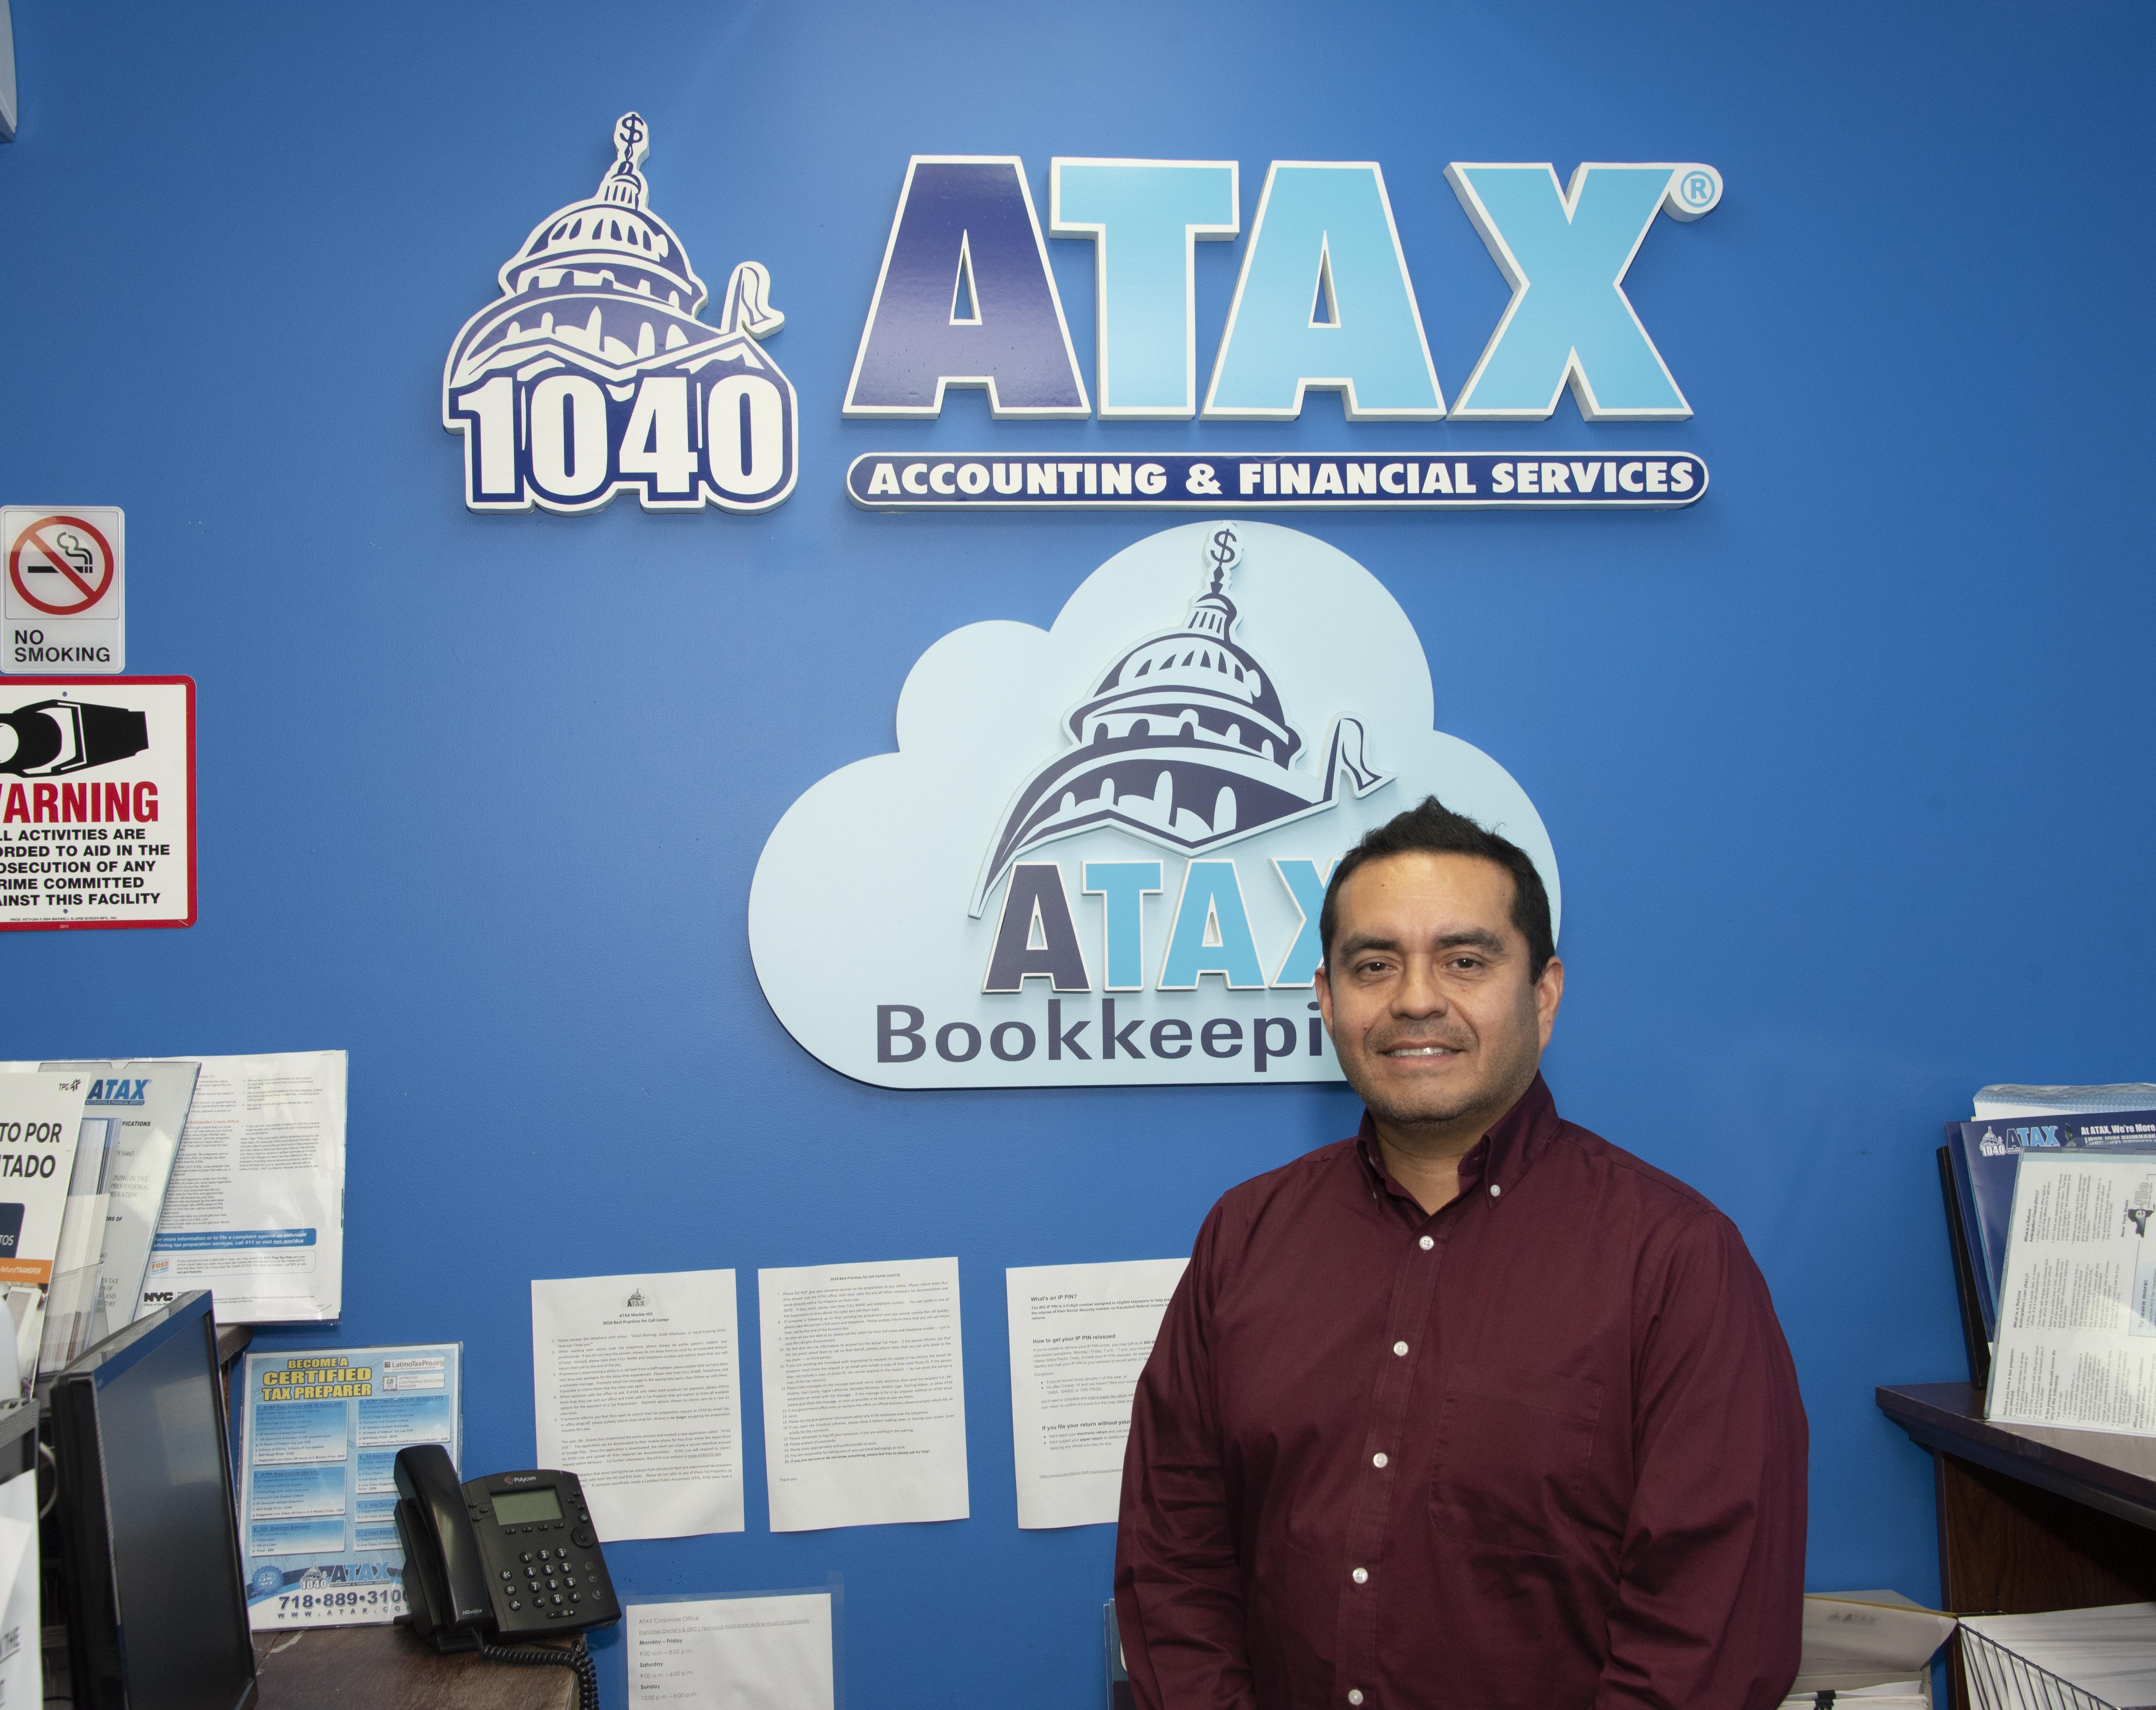 ATAX Bookkeeping Juan Carlos Lopez